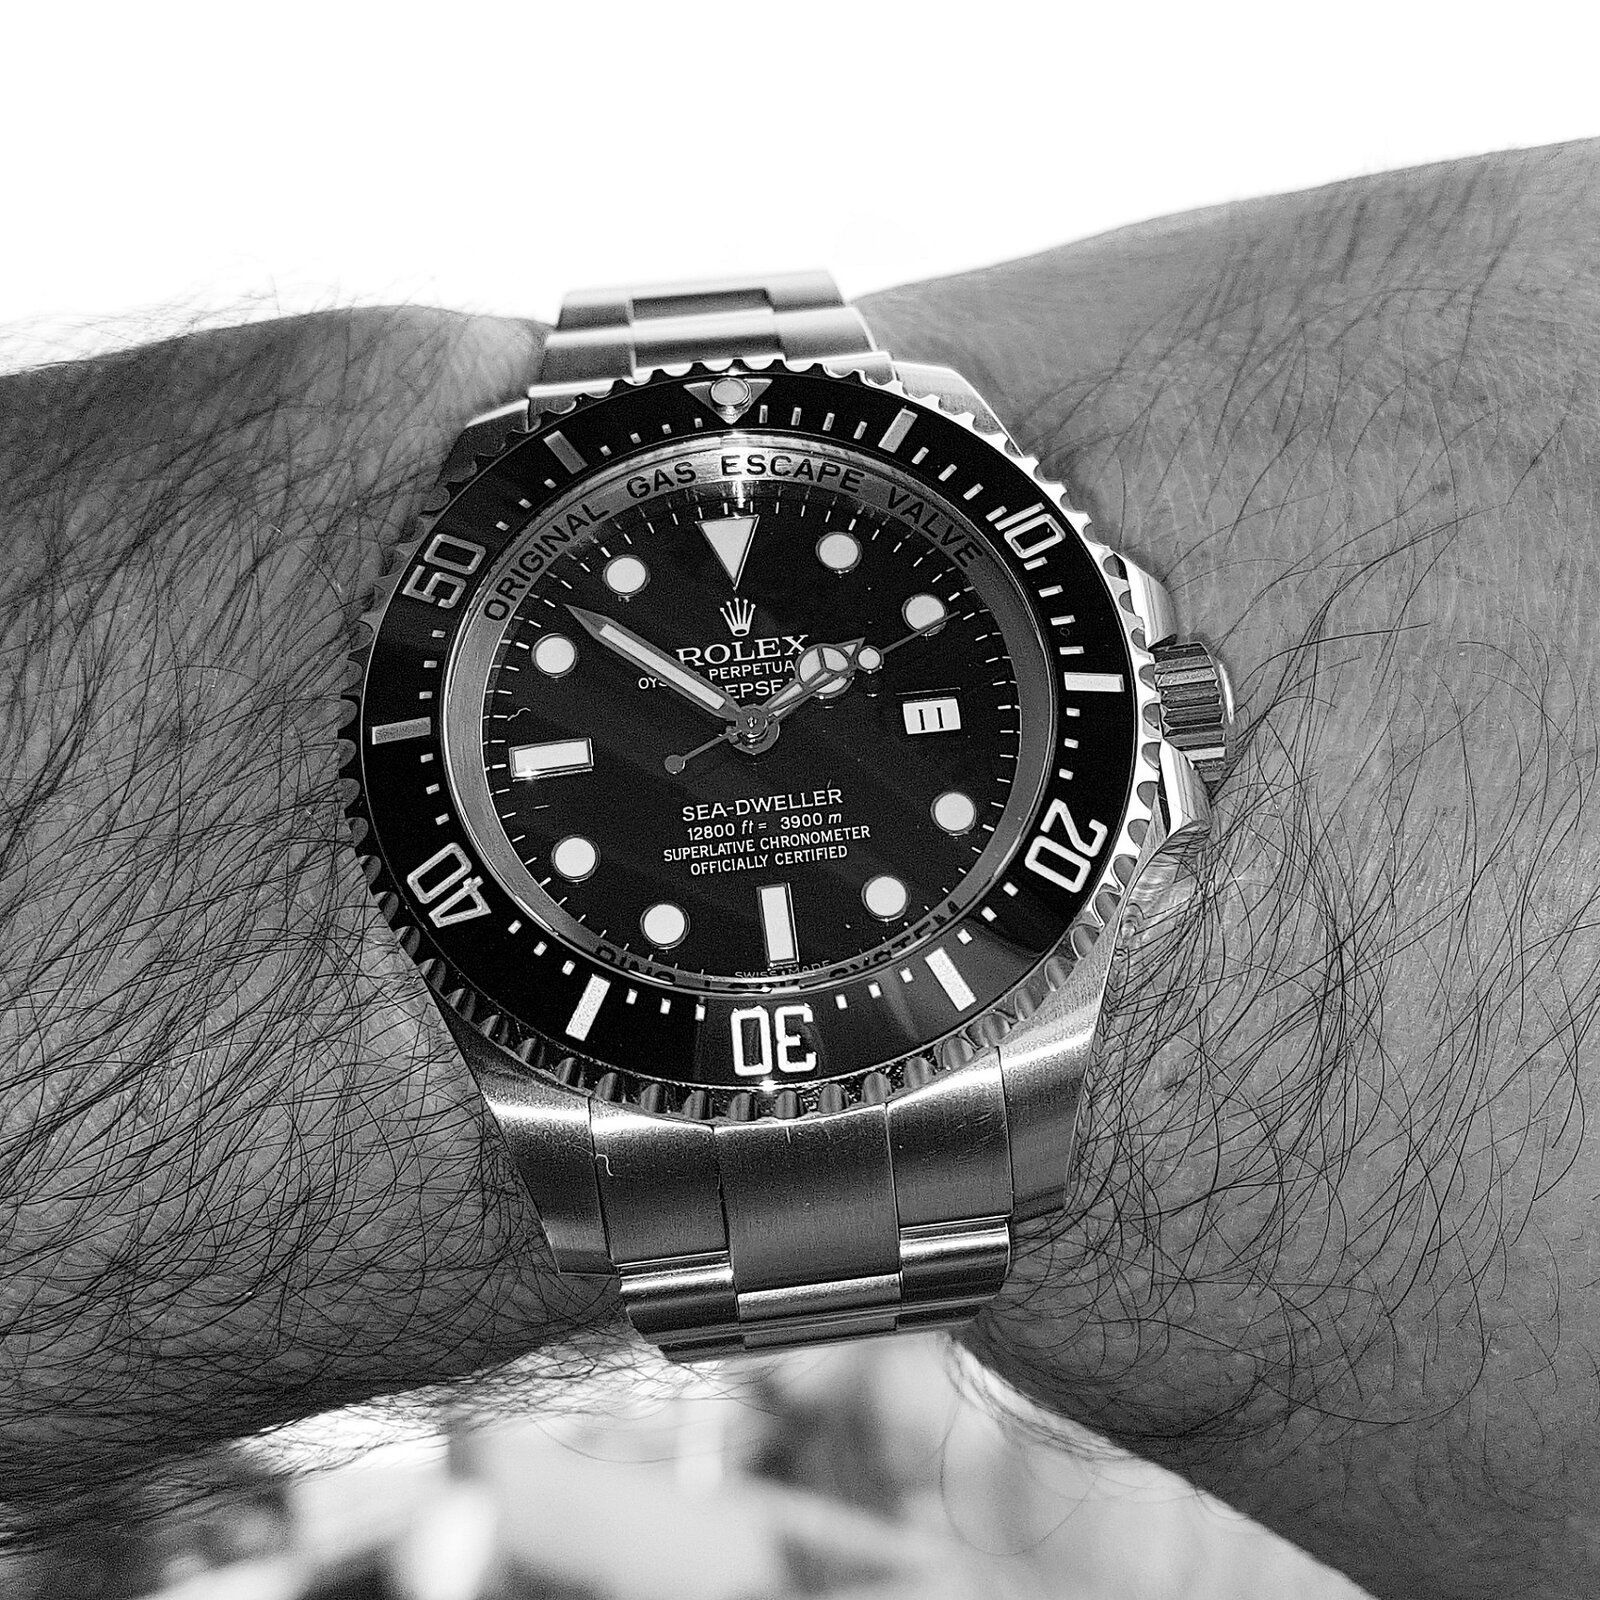 Rolex Sea-Dweller Deepsea 44mm 3900M Cal. 3135 Ref. 116660 (B&W).jpg